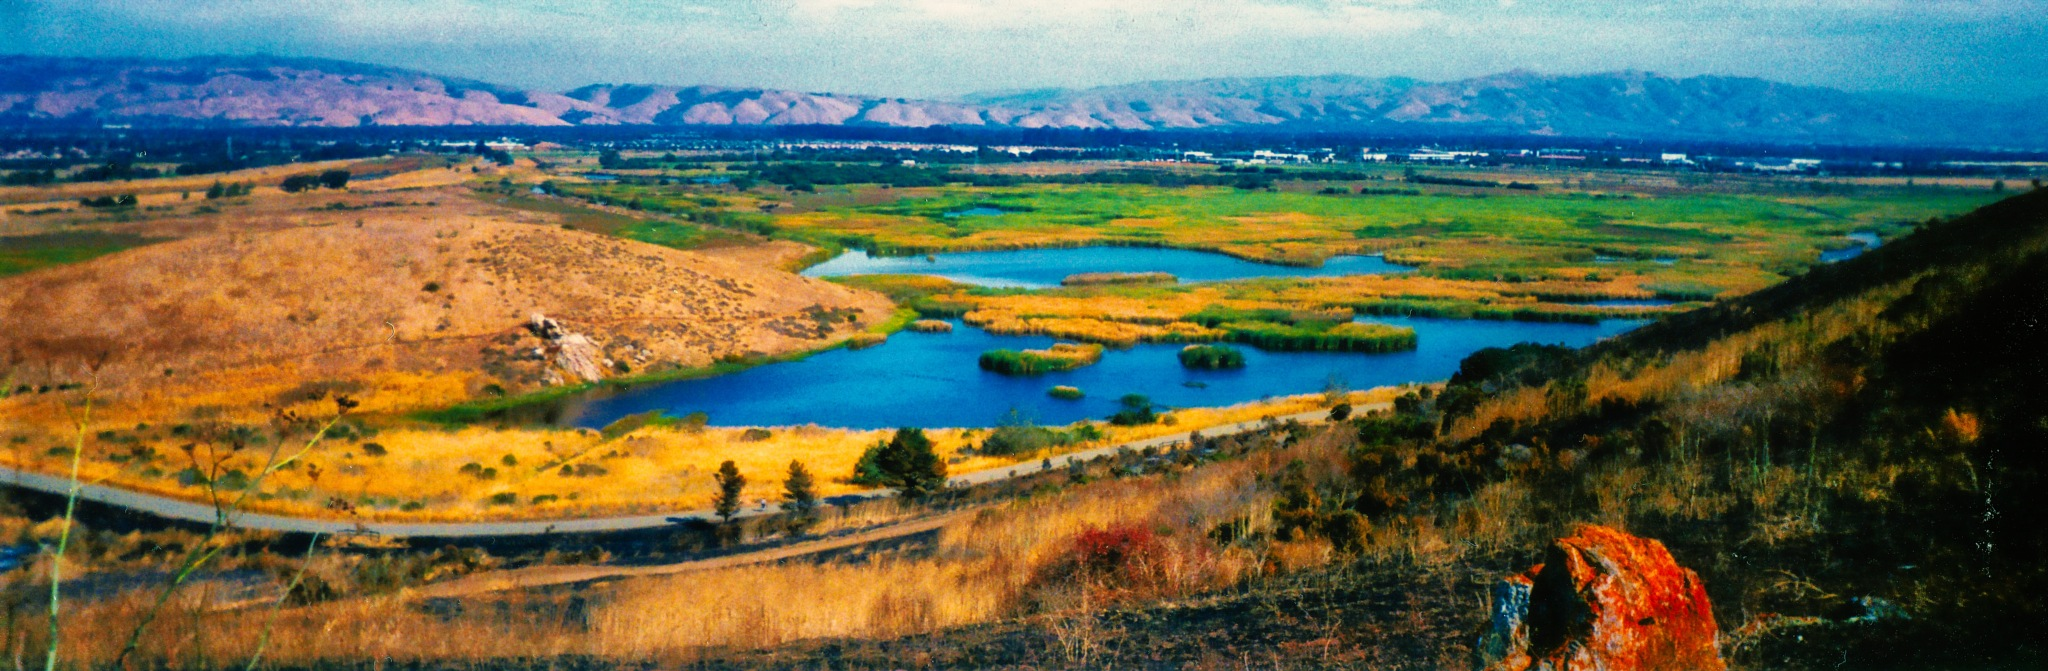 Hills view by AJ Yakstrangler Andy Jamieson